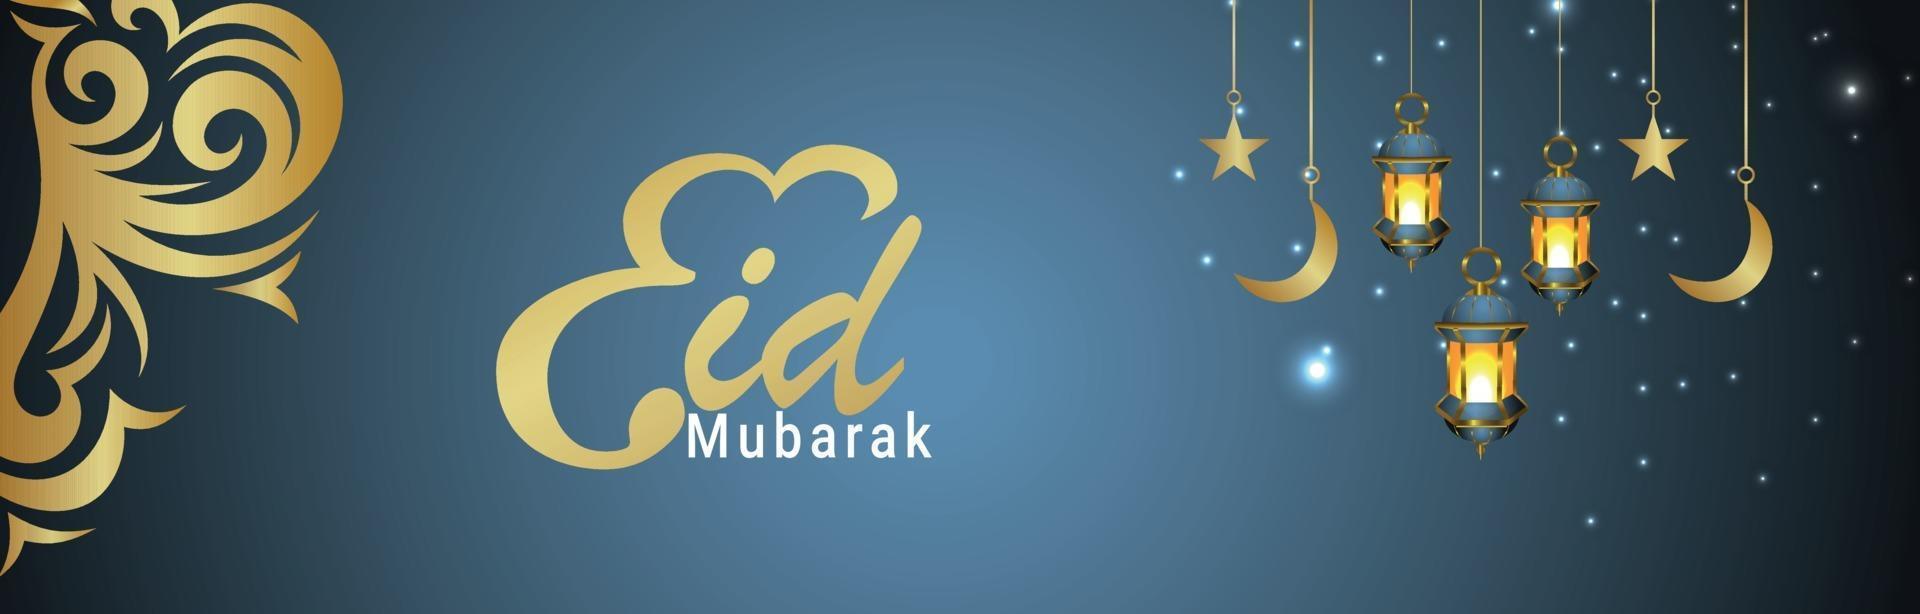 eid mubarak firande banner vektor